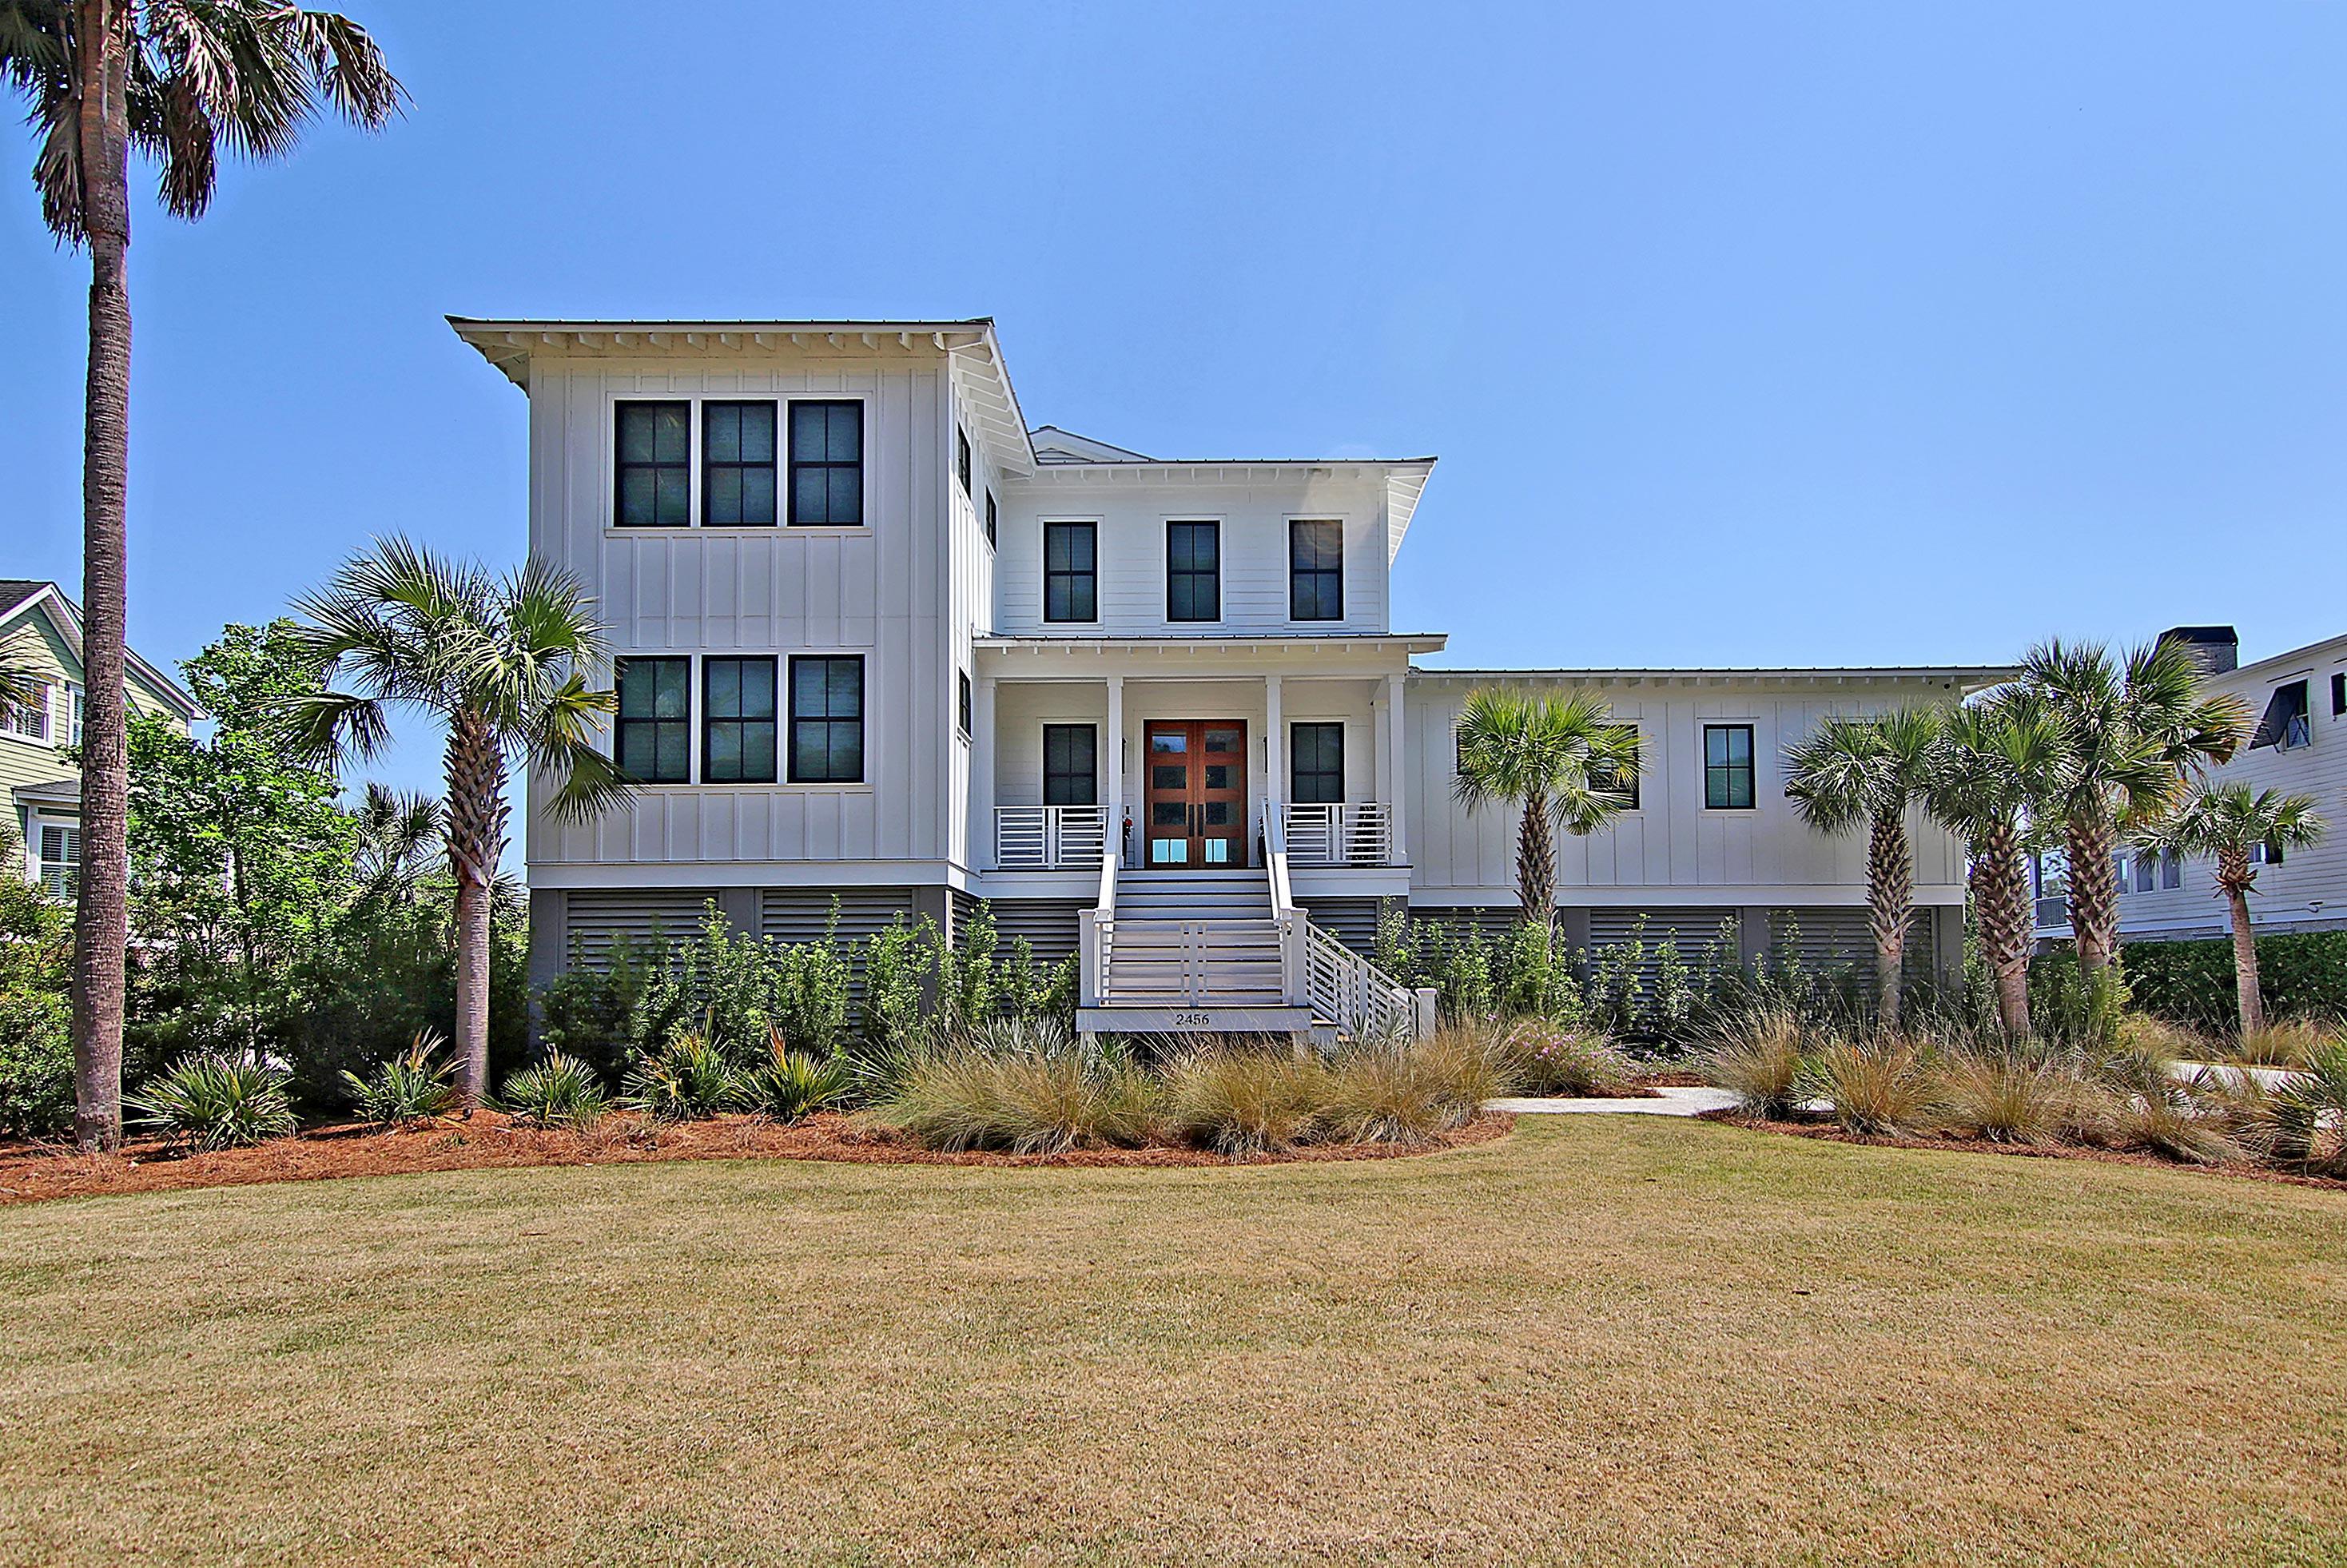 Dunes West Homes For Sale - 2456 Darts Cove, Mount Pleasant, SC - 7